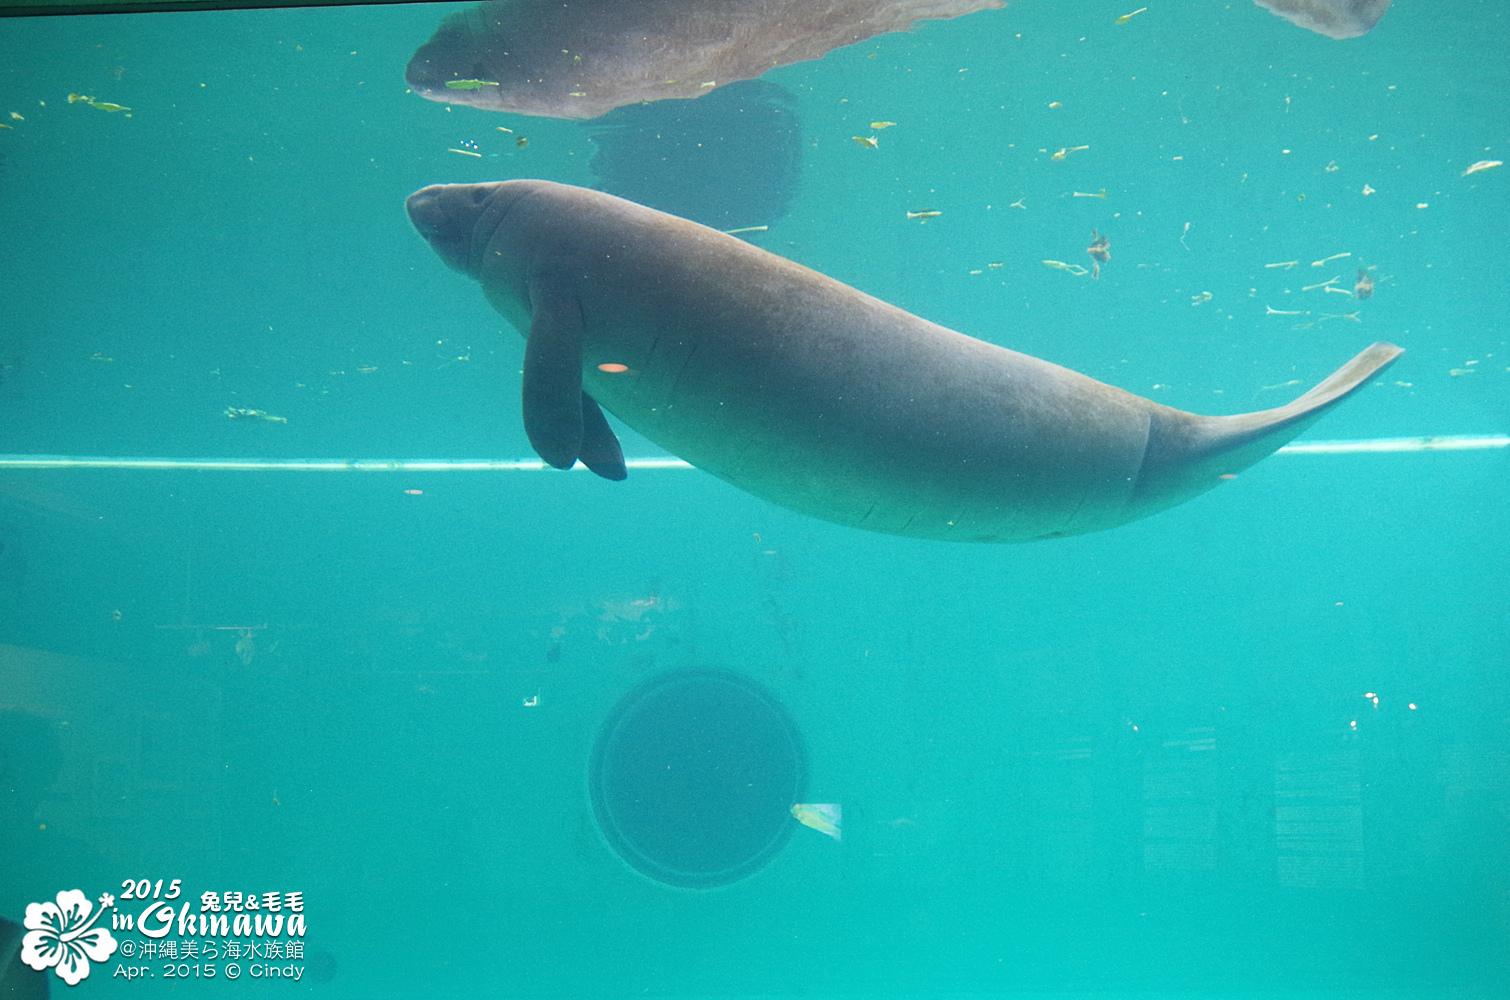 2015-0405-沖縄美ら海水族館-42